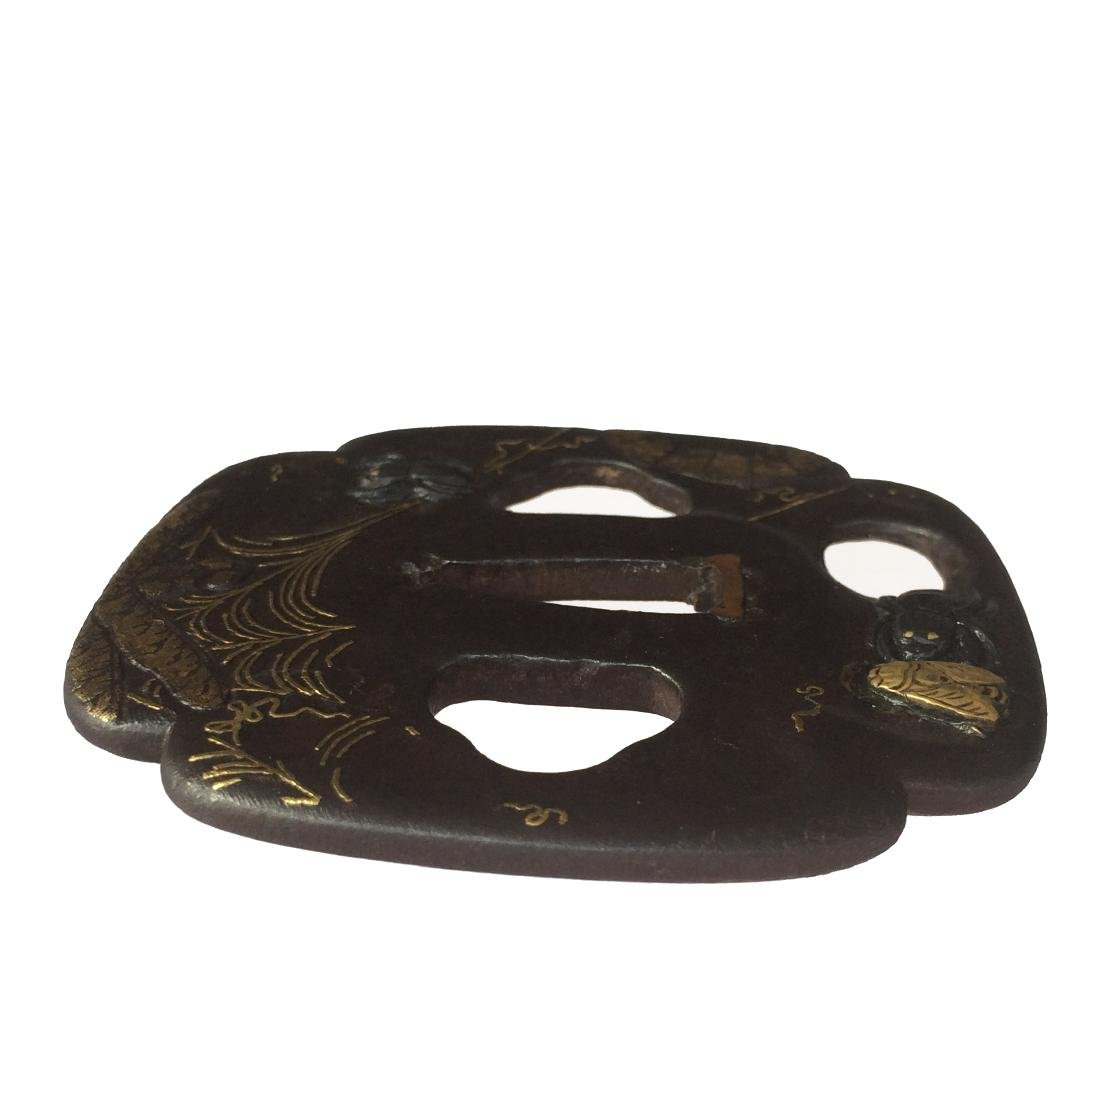 Kumagai (Edo-Higo) tsuba of iron with shakudo and gold - 2